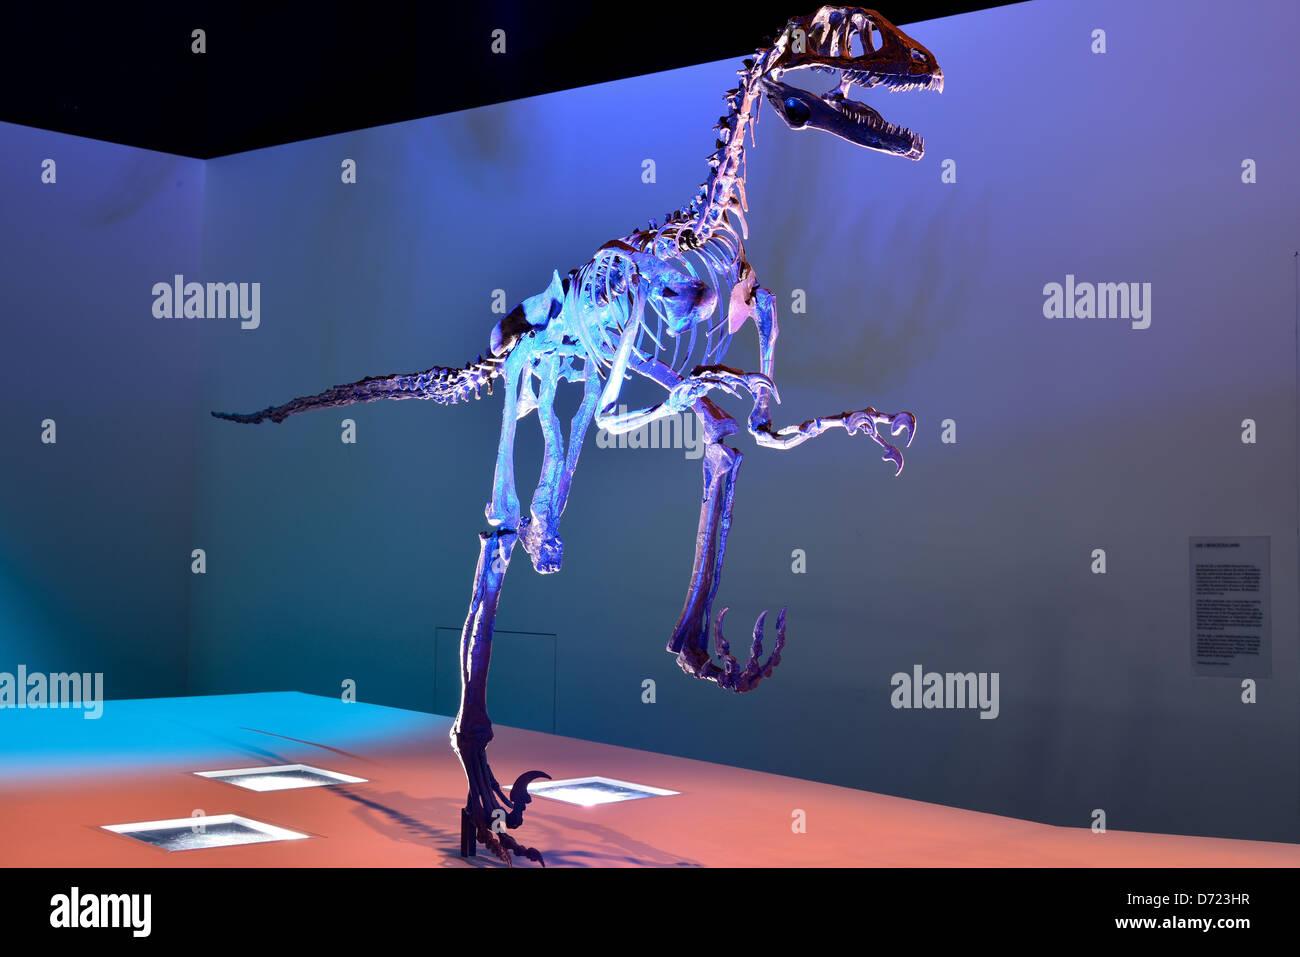 Fossil skeleton of a Deinonychus dinosaur. Cretaceous age. - Stock Image